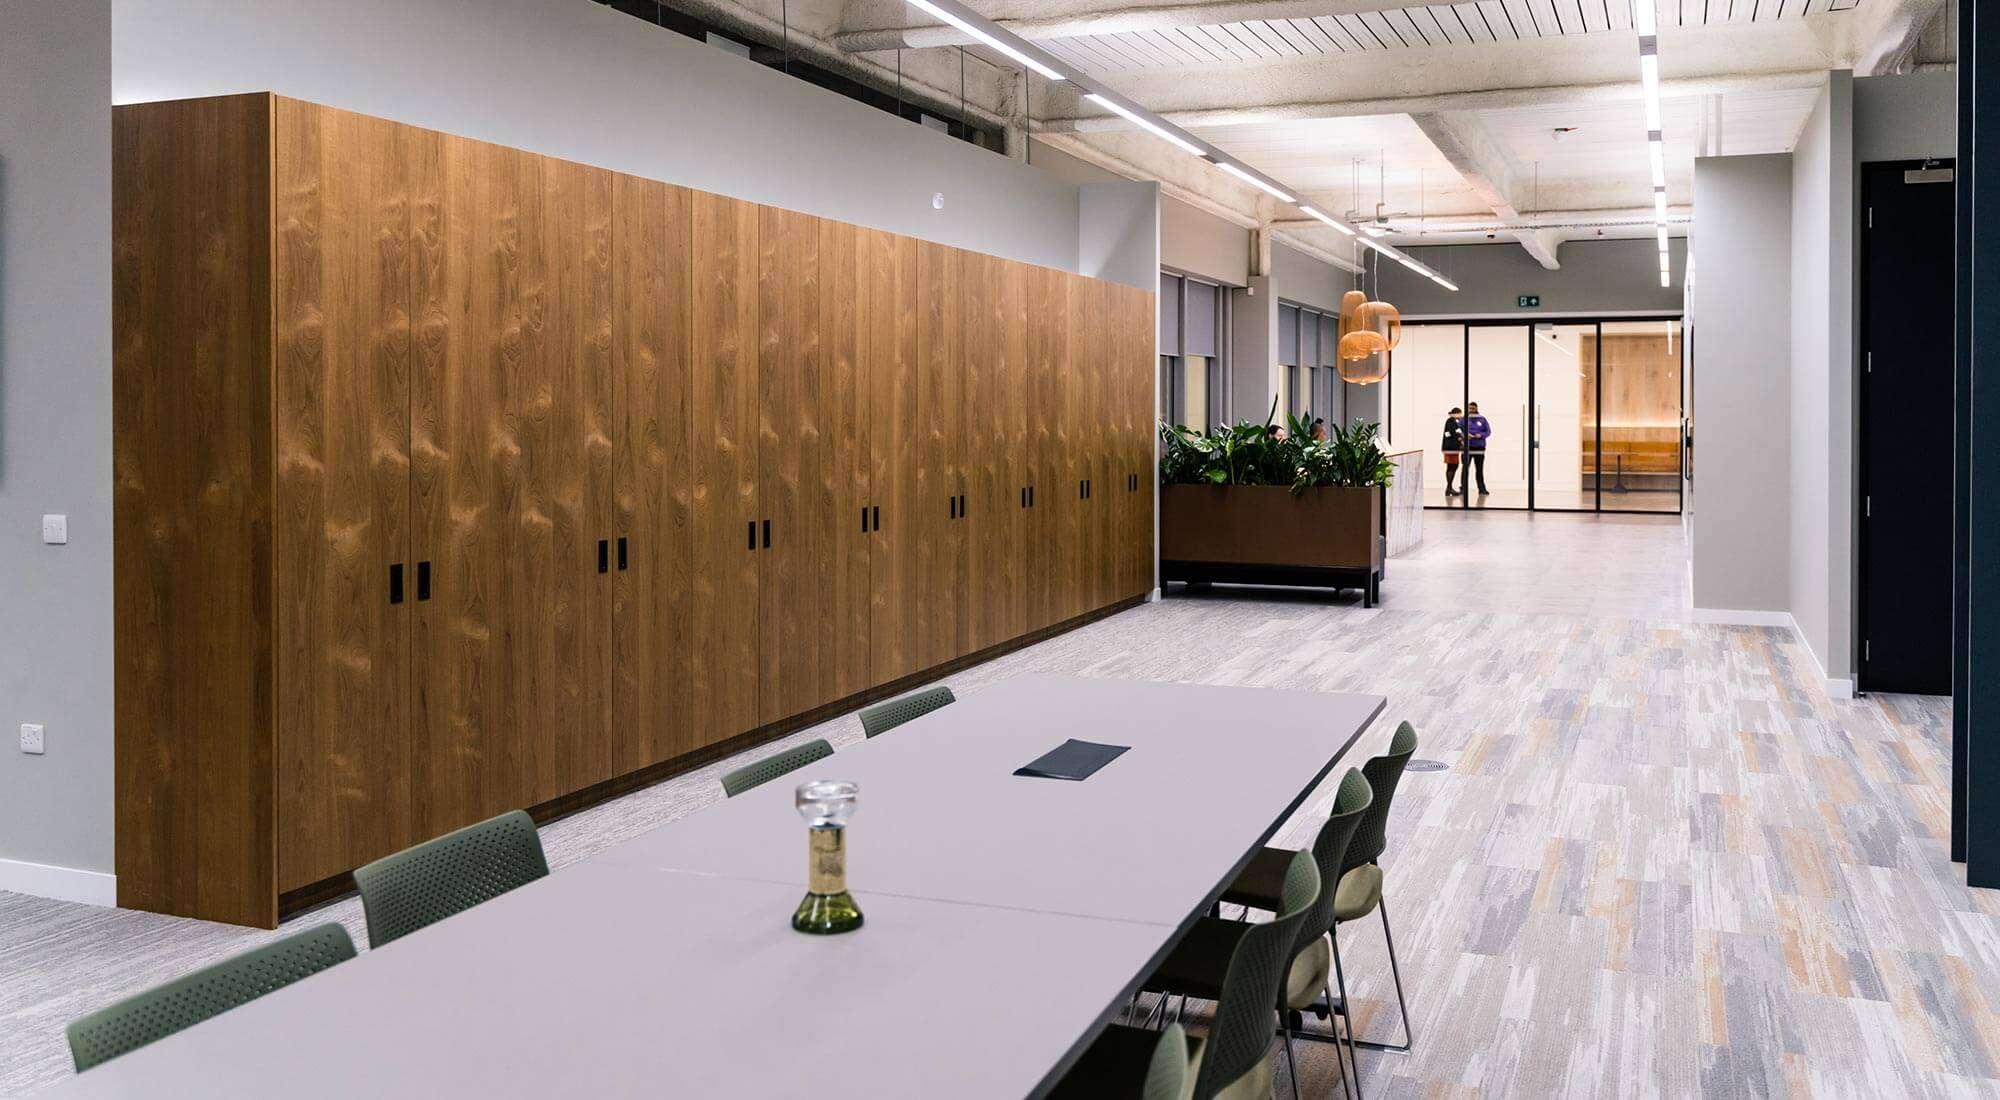 Office refurbishment with Reception teak wardrobe